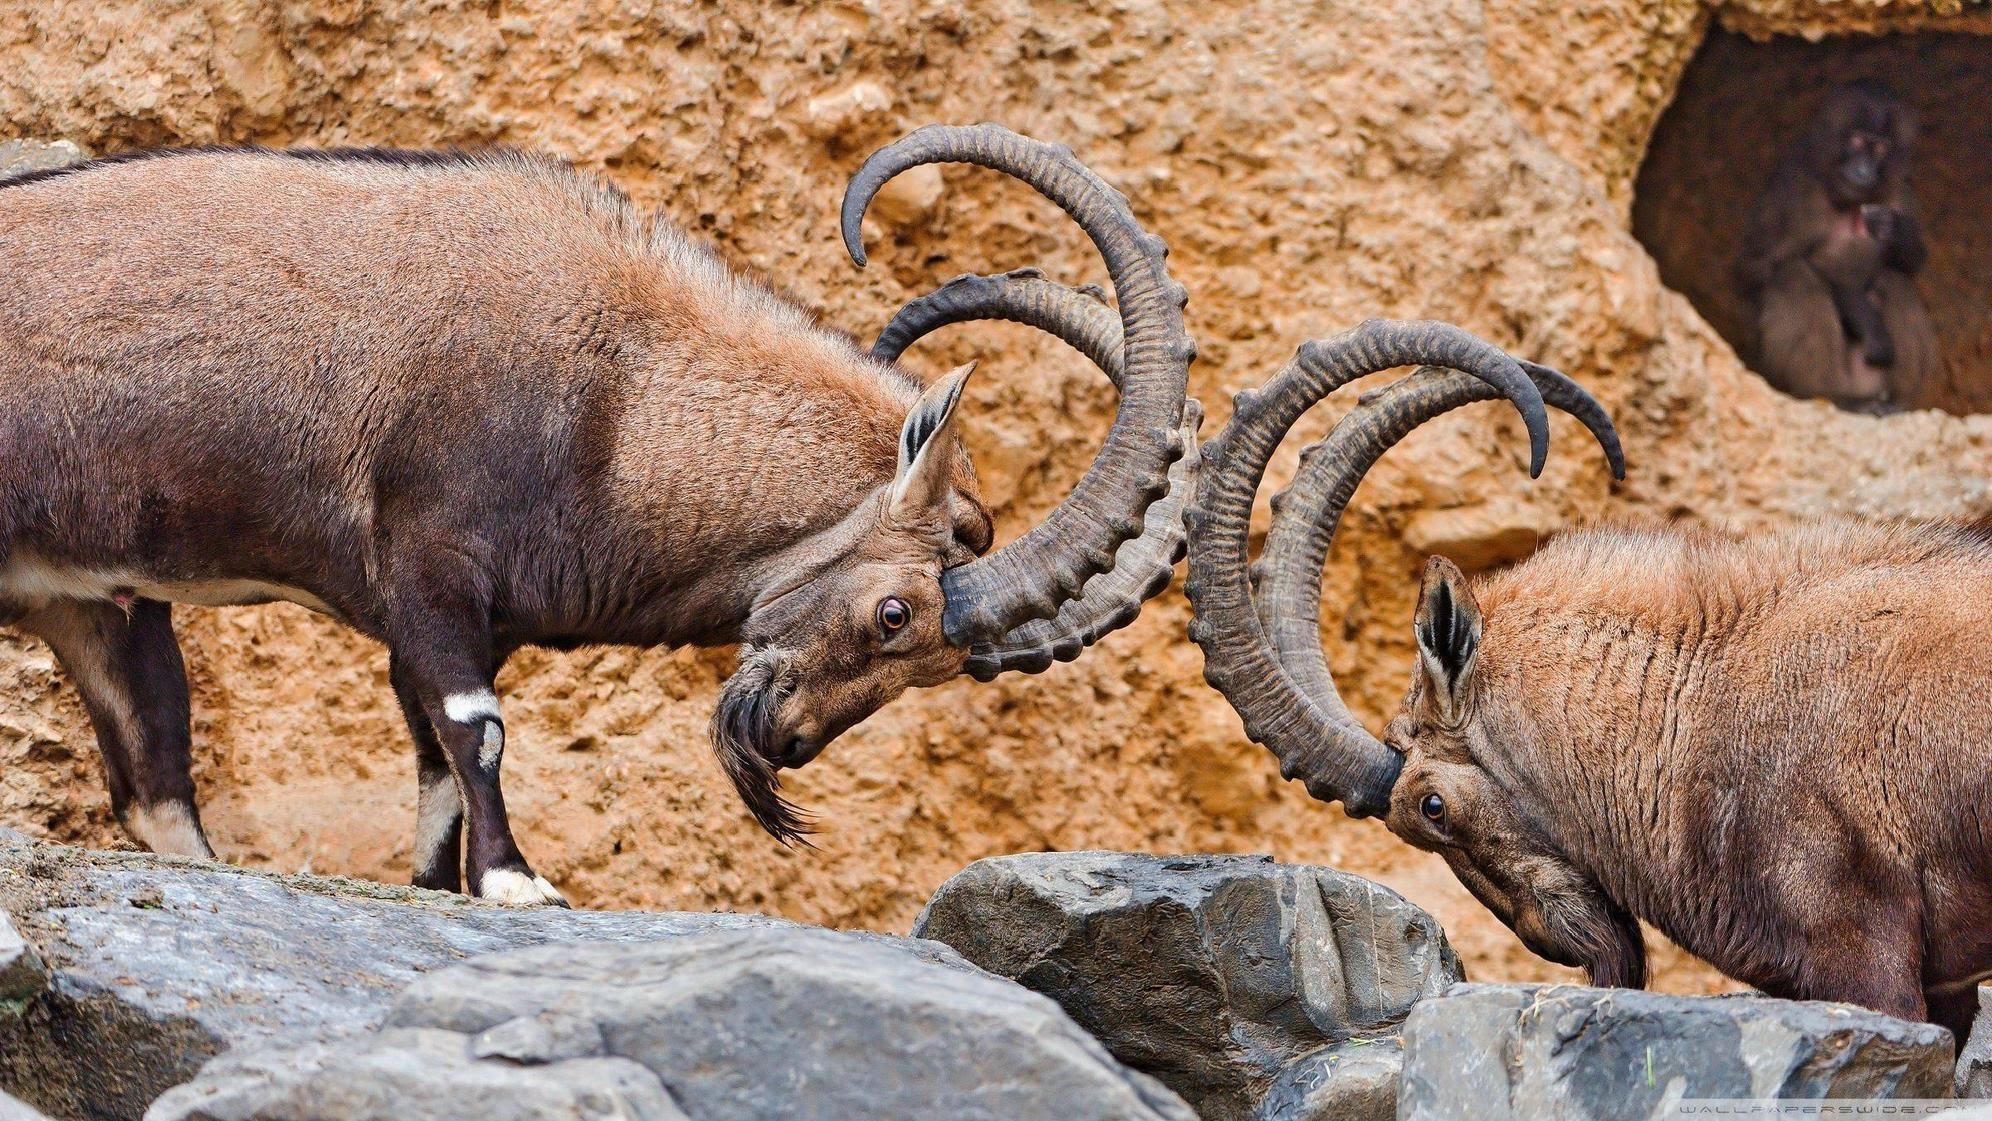 Goats-fighting.jpg